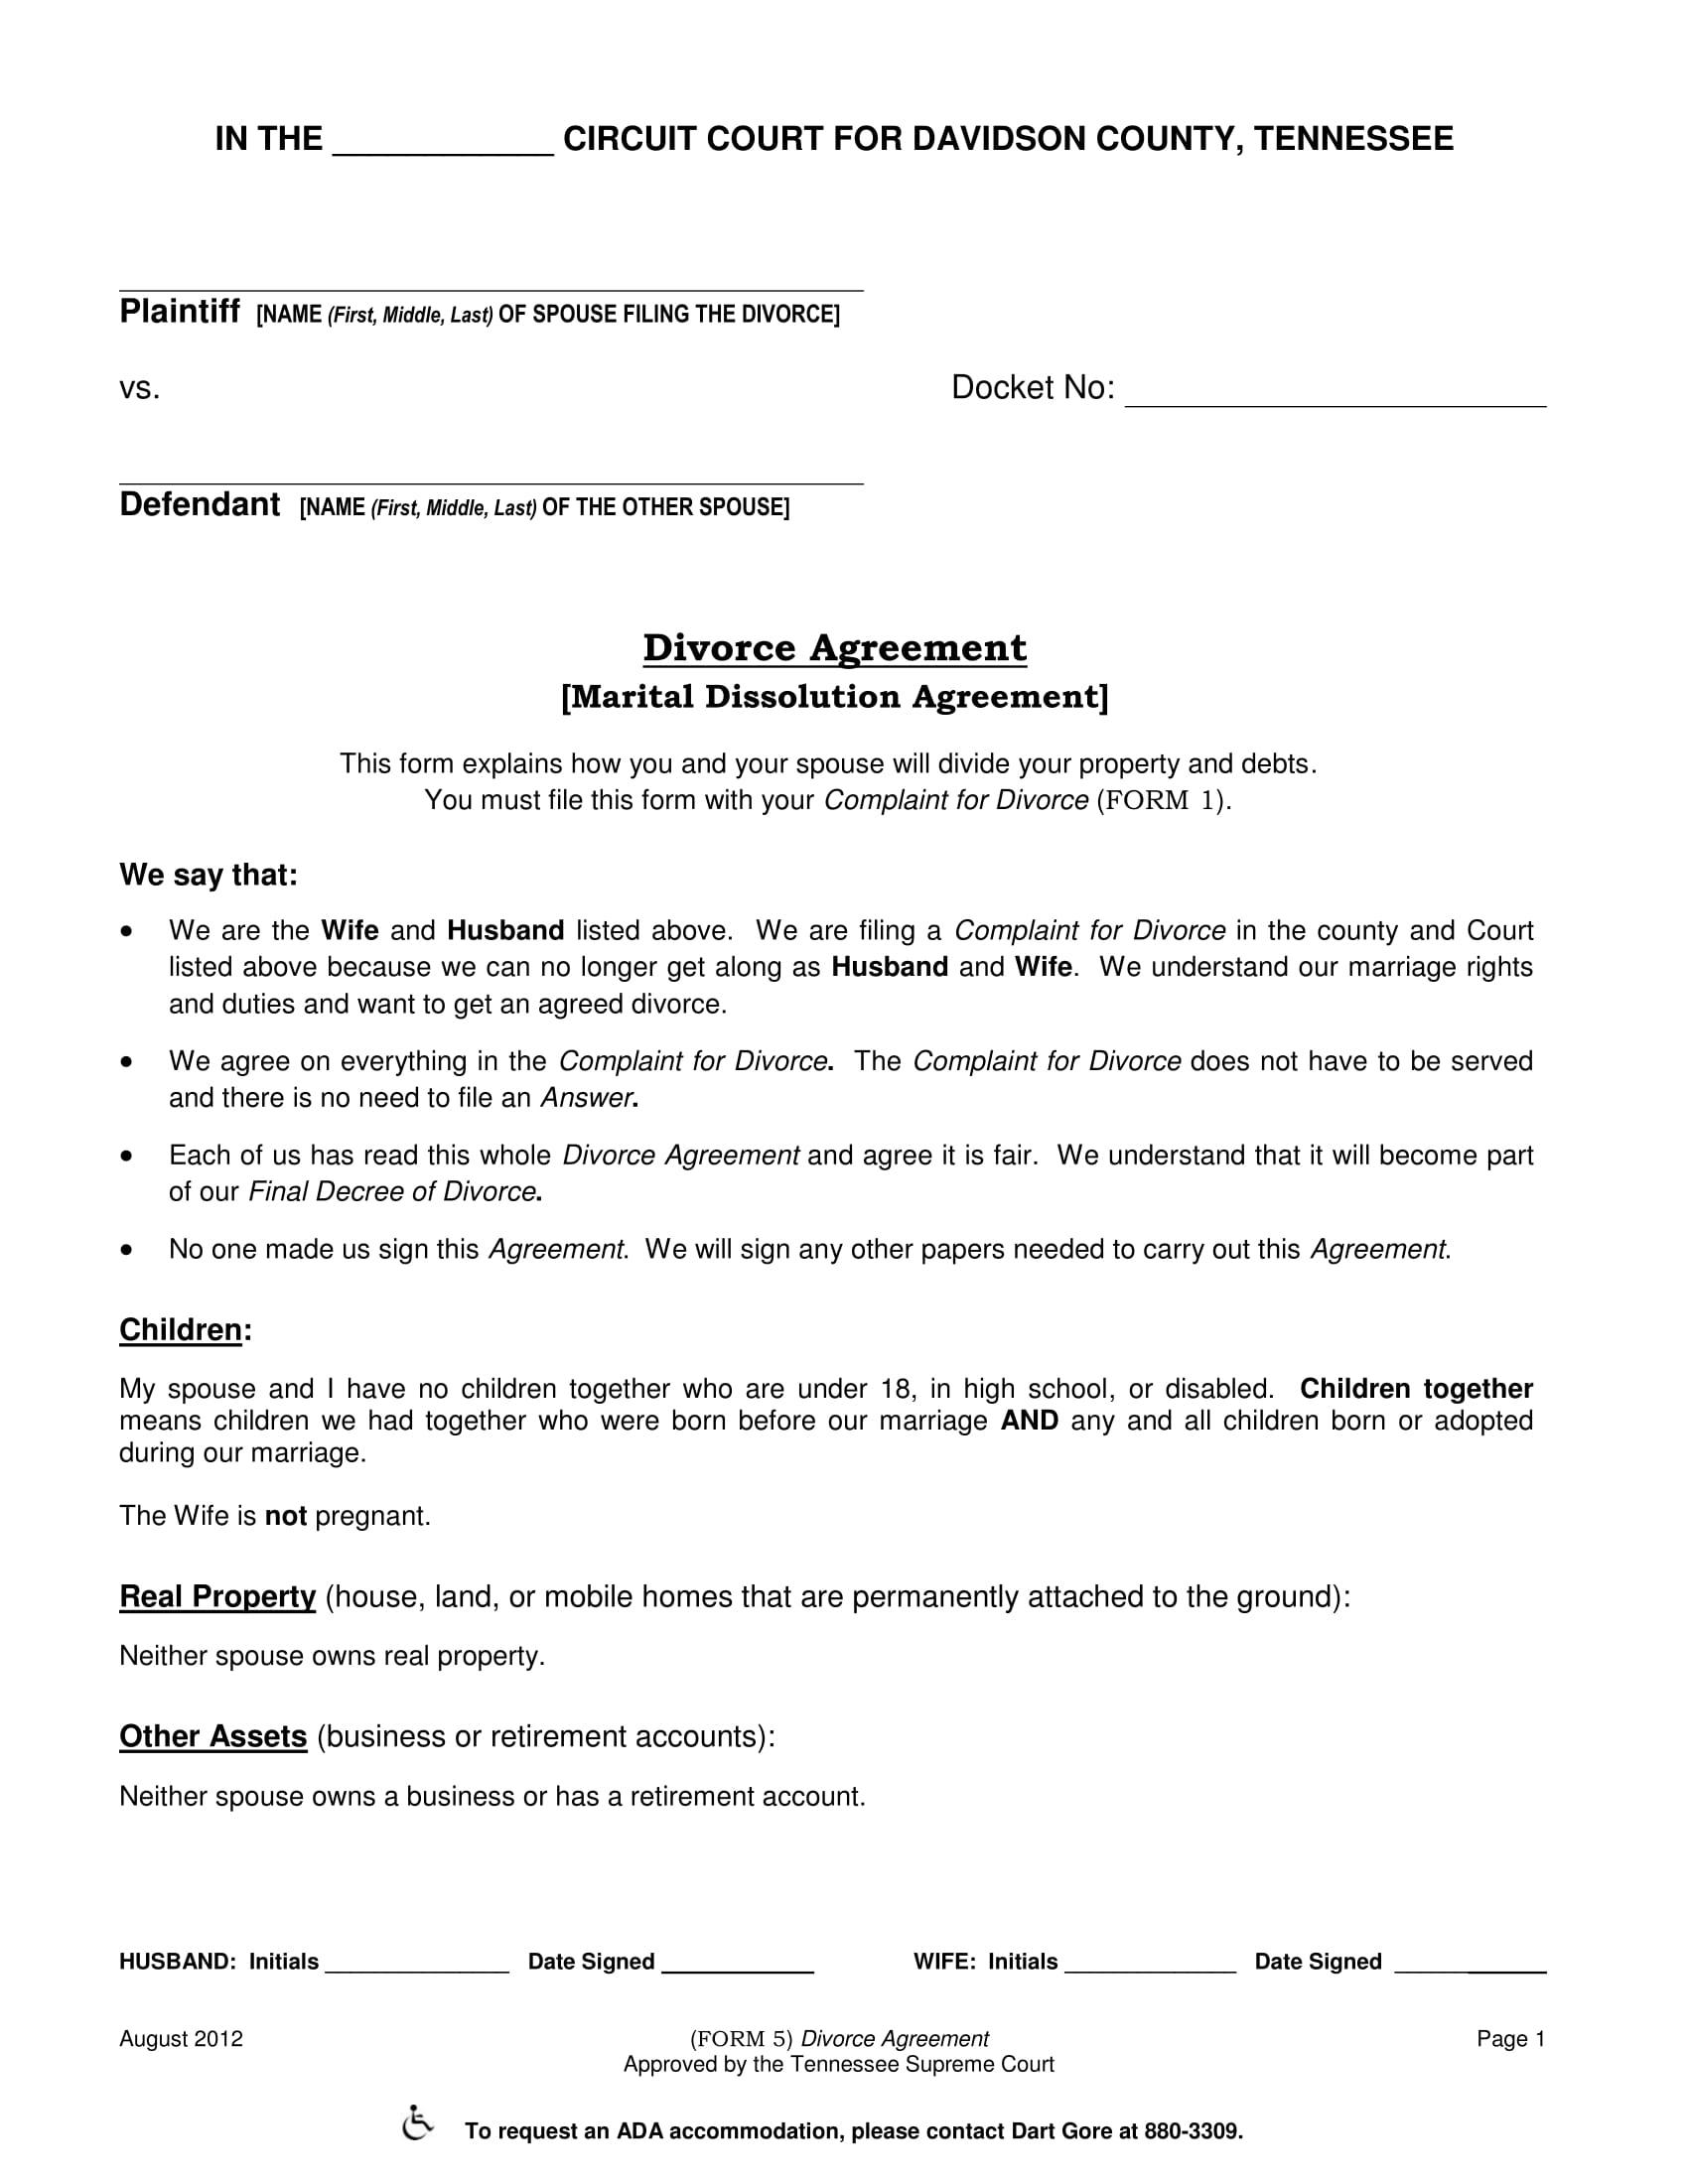 divorce agreement form 1